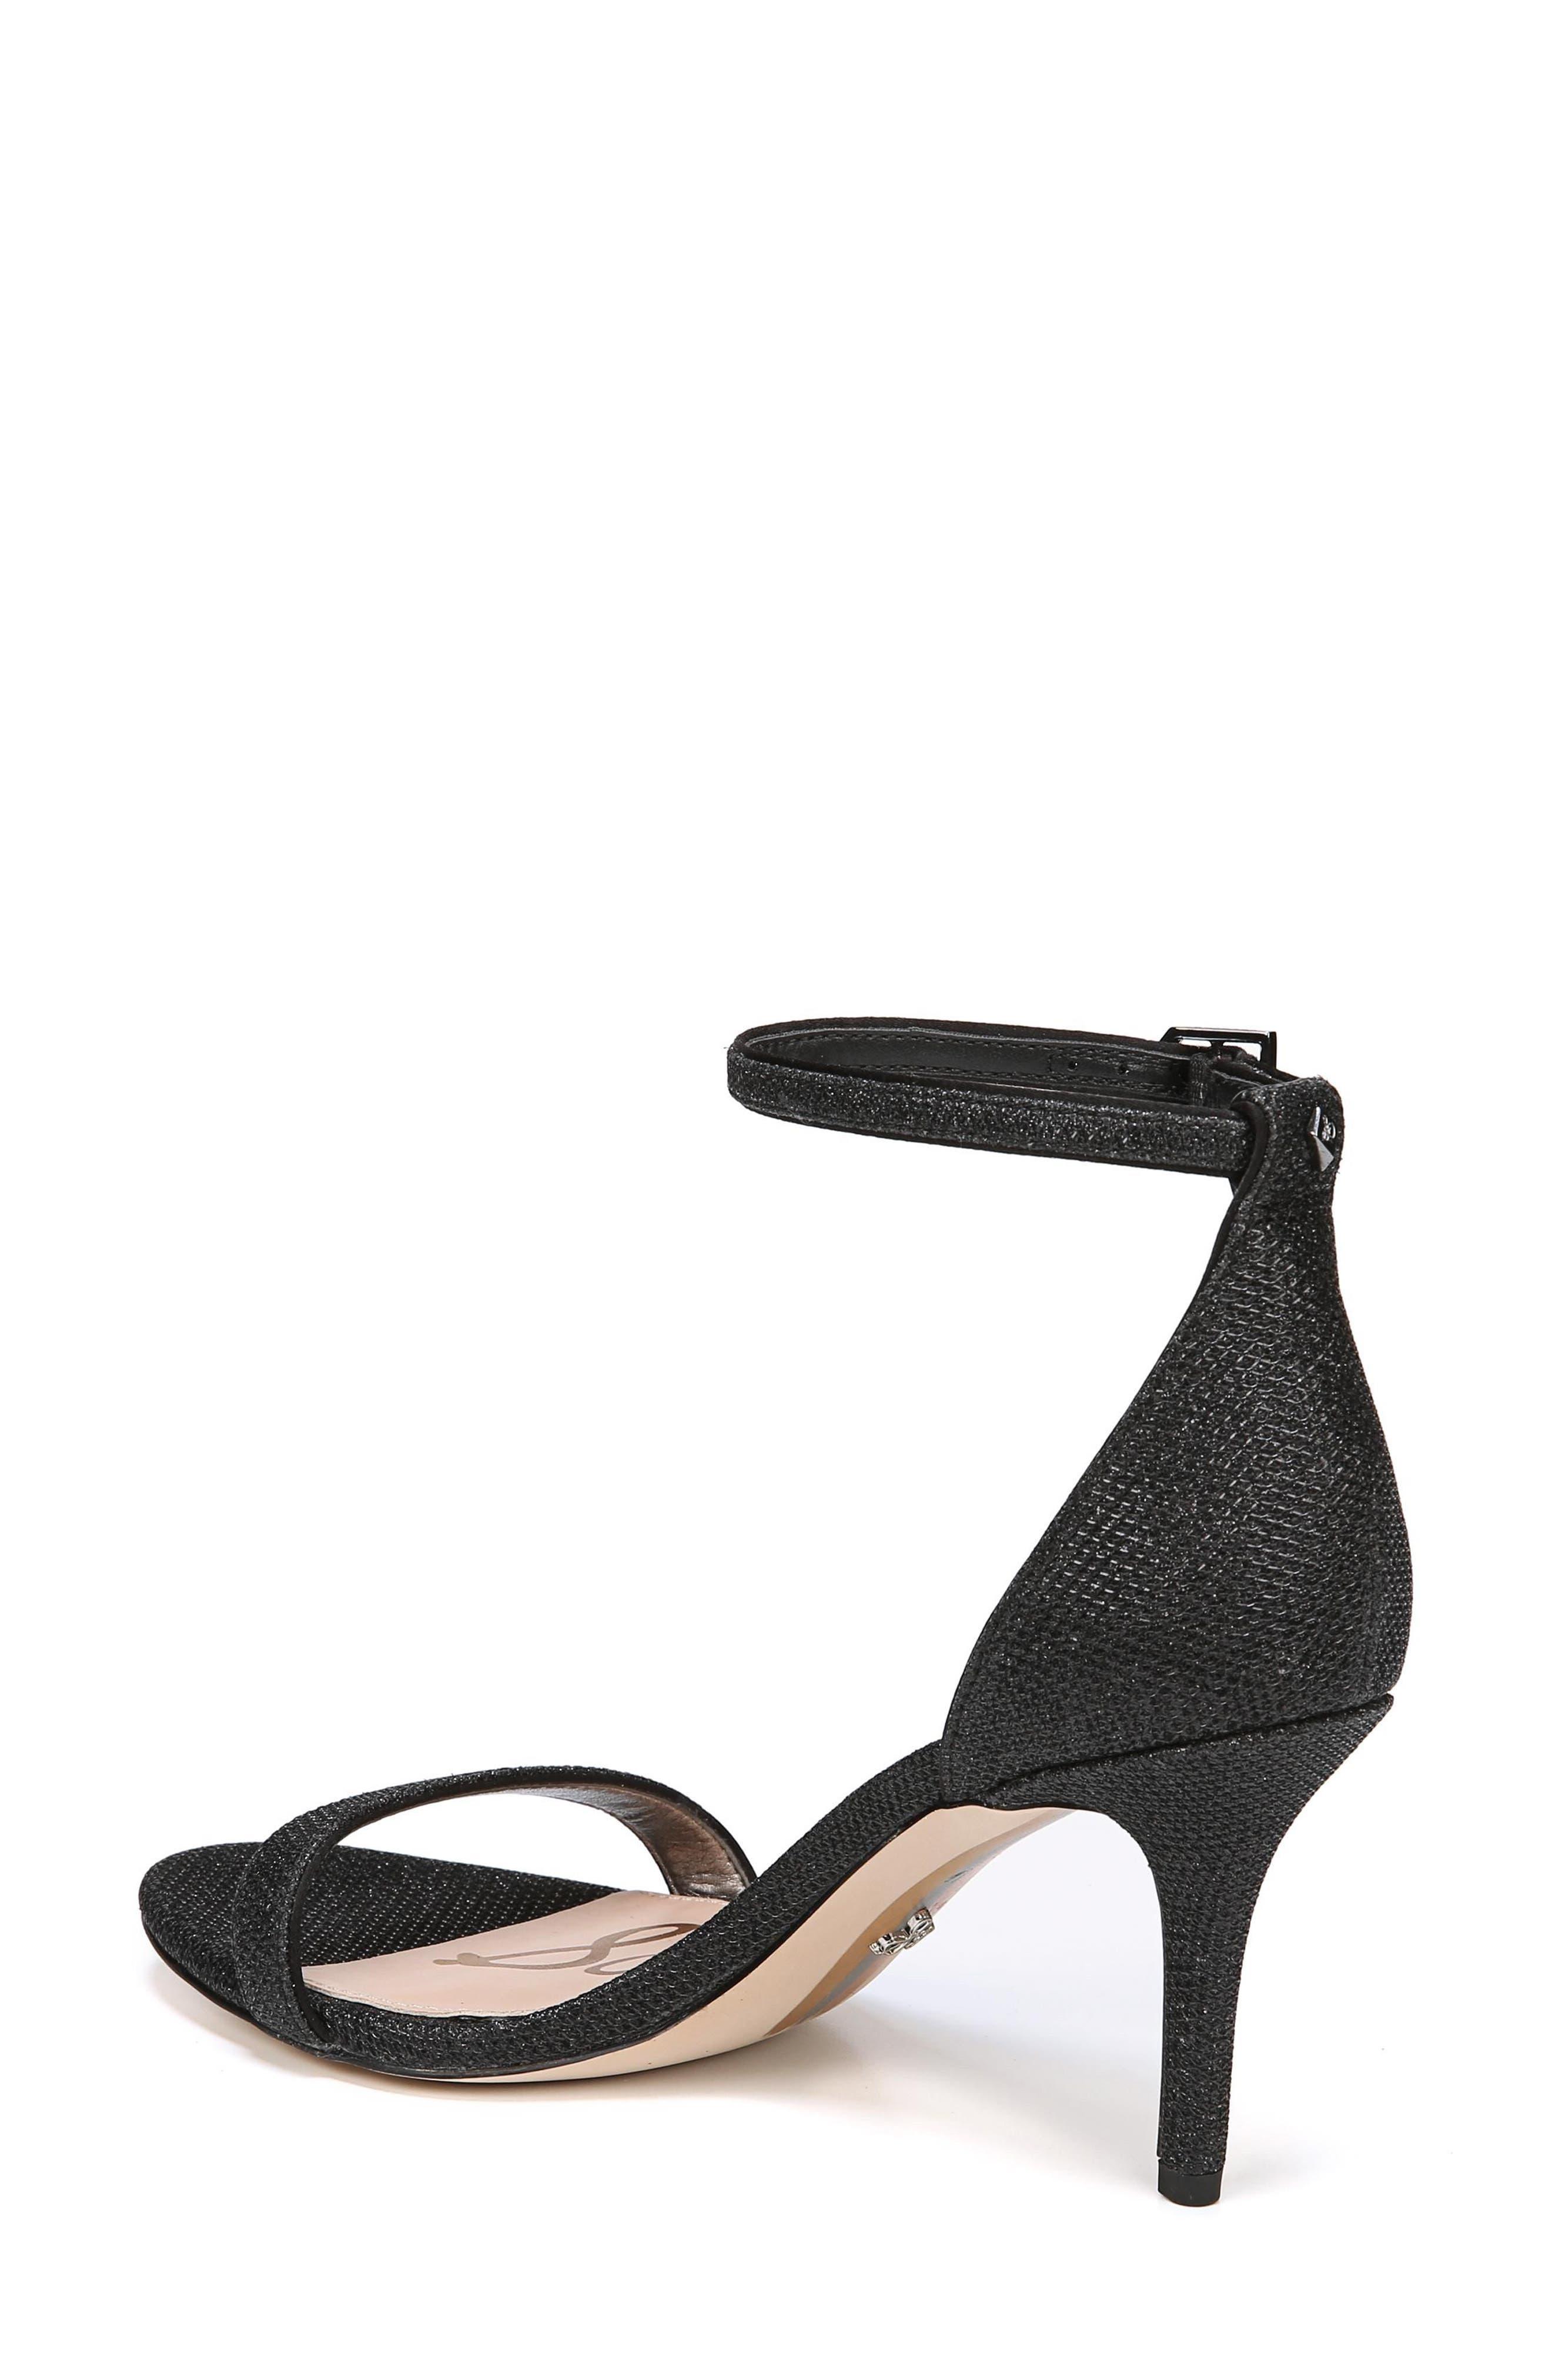 ,                             'Patti' Ankle Strap Sandal,                             Alternate thumbnail 2, color,                             003